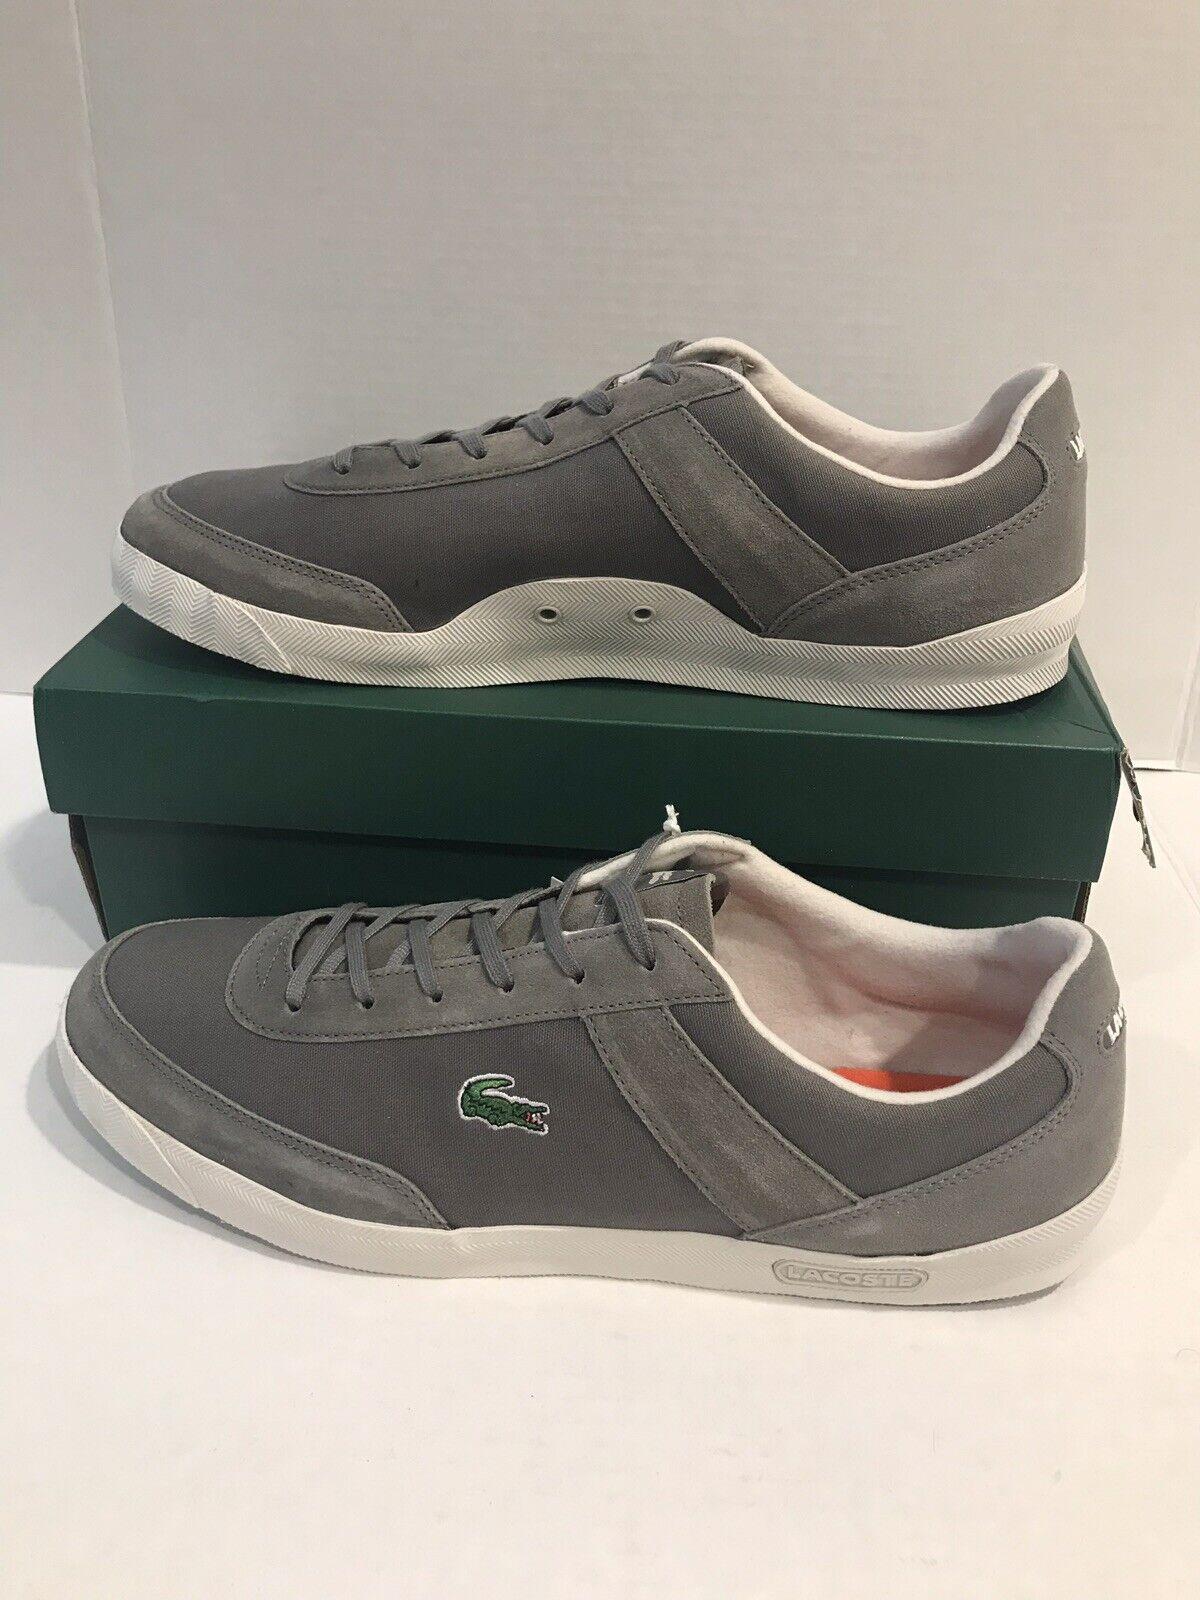 Lacoste Suzuka Hombre S Spm gris Hombre Zapatos para Andar Lona  Ante